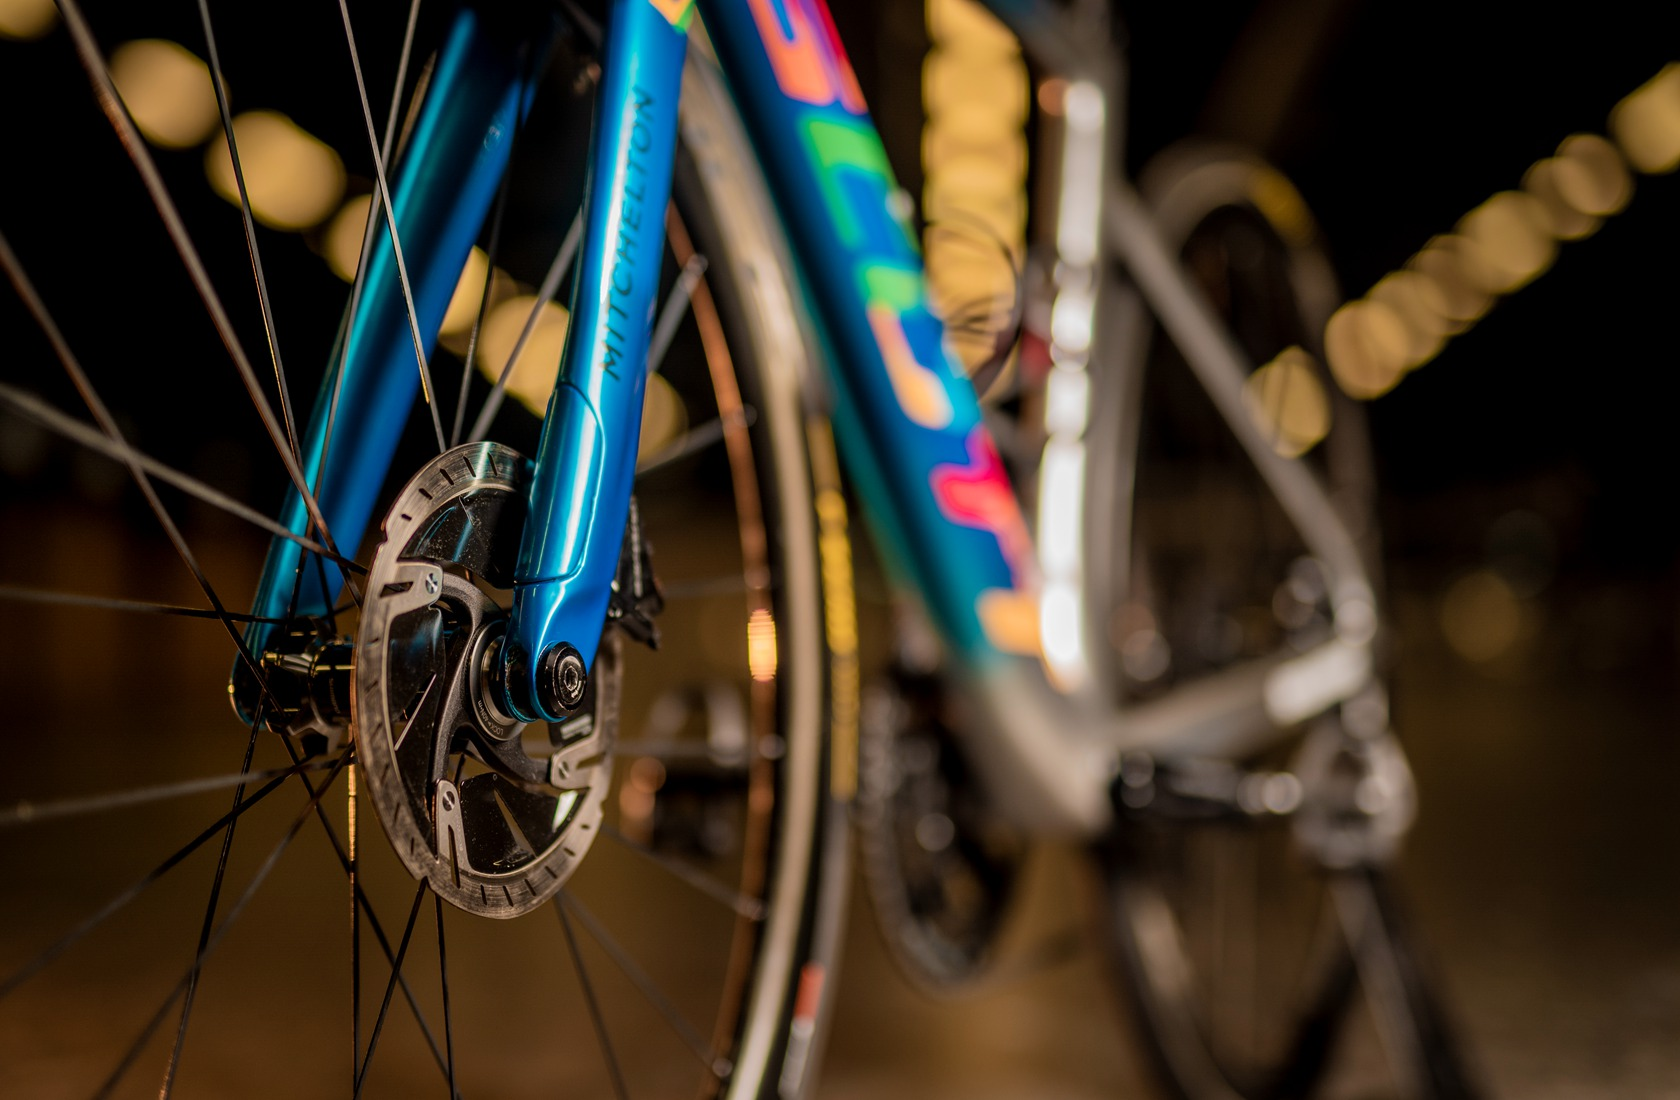 chaves-behind-the-smile-post2_000x000_image_2019_bike_scott-sports_en (1).jpg